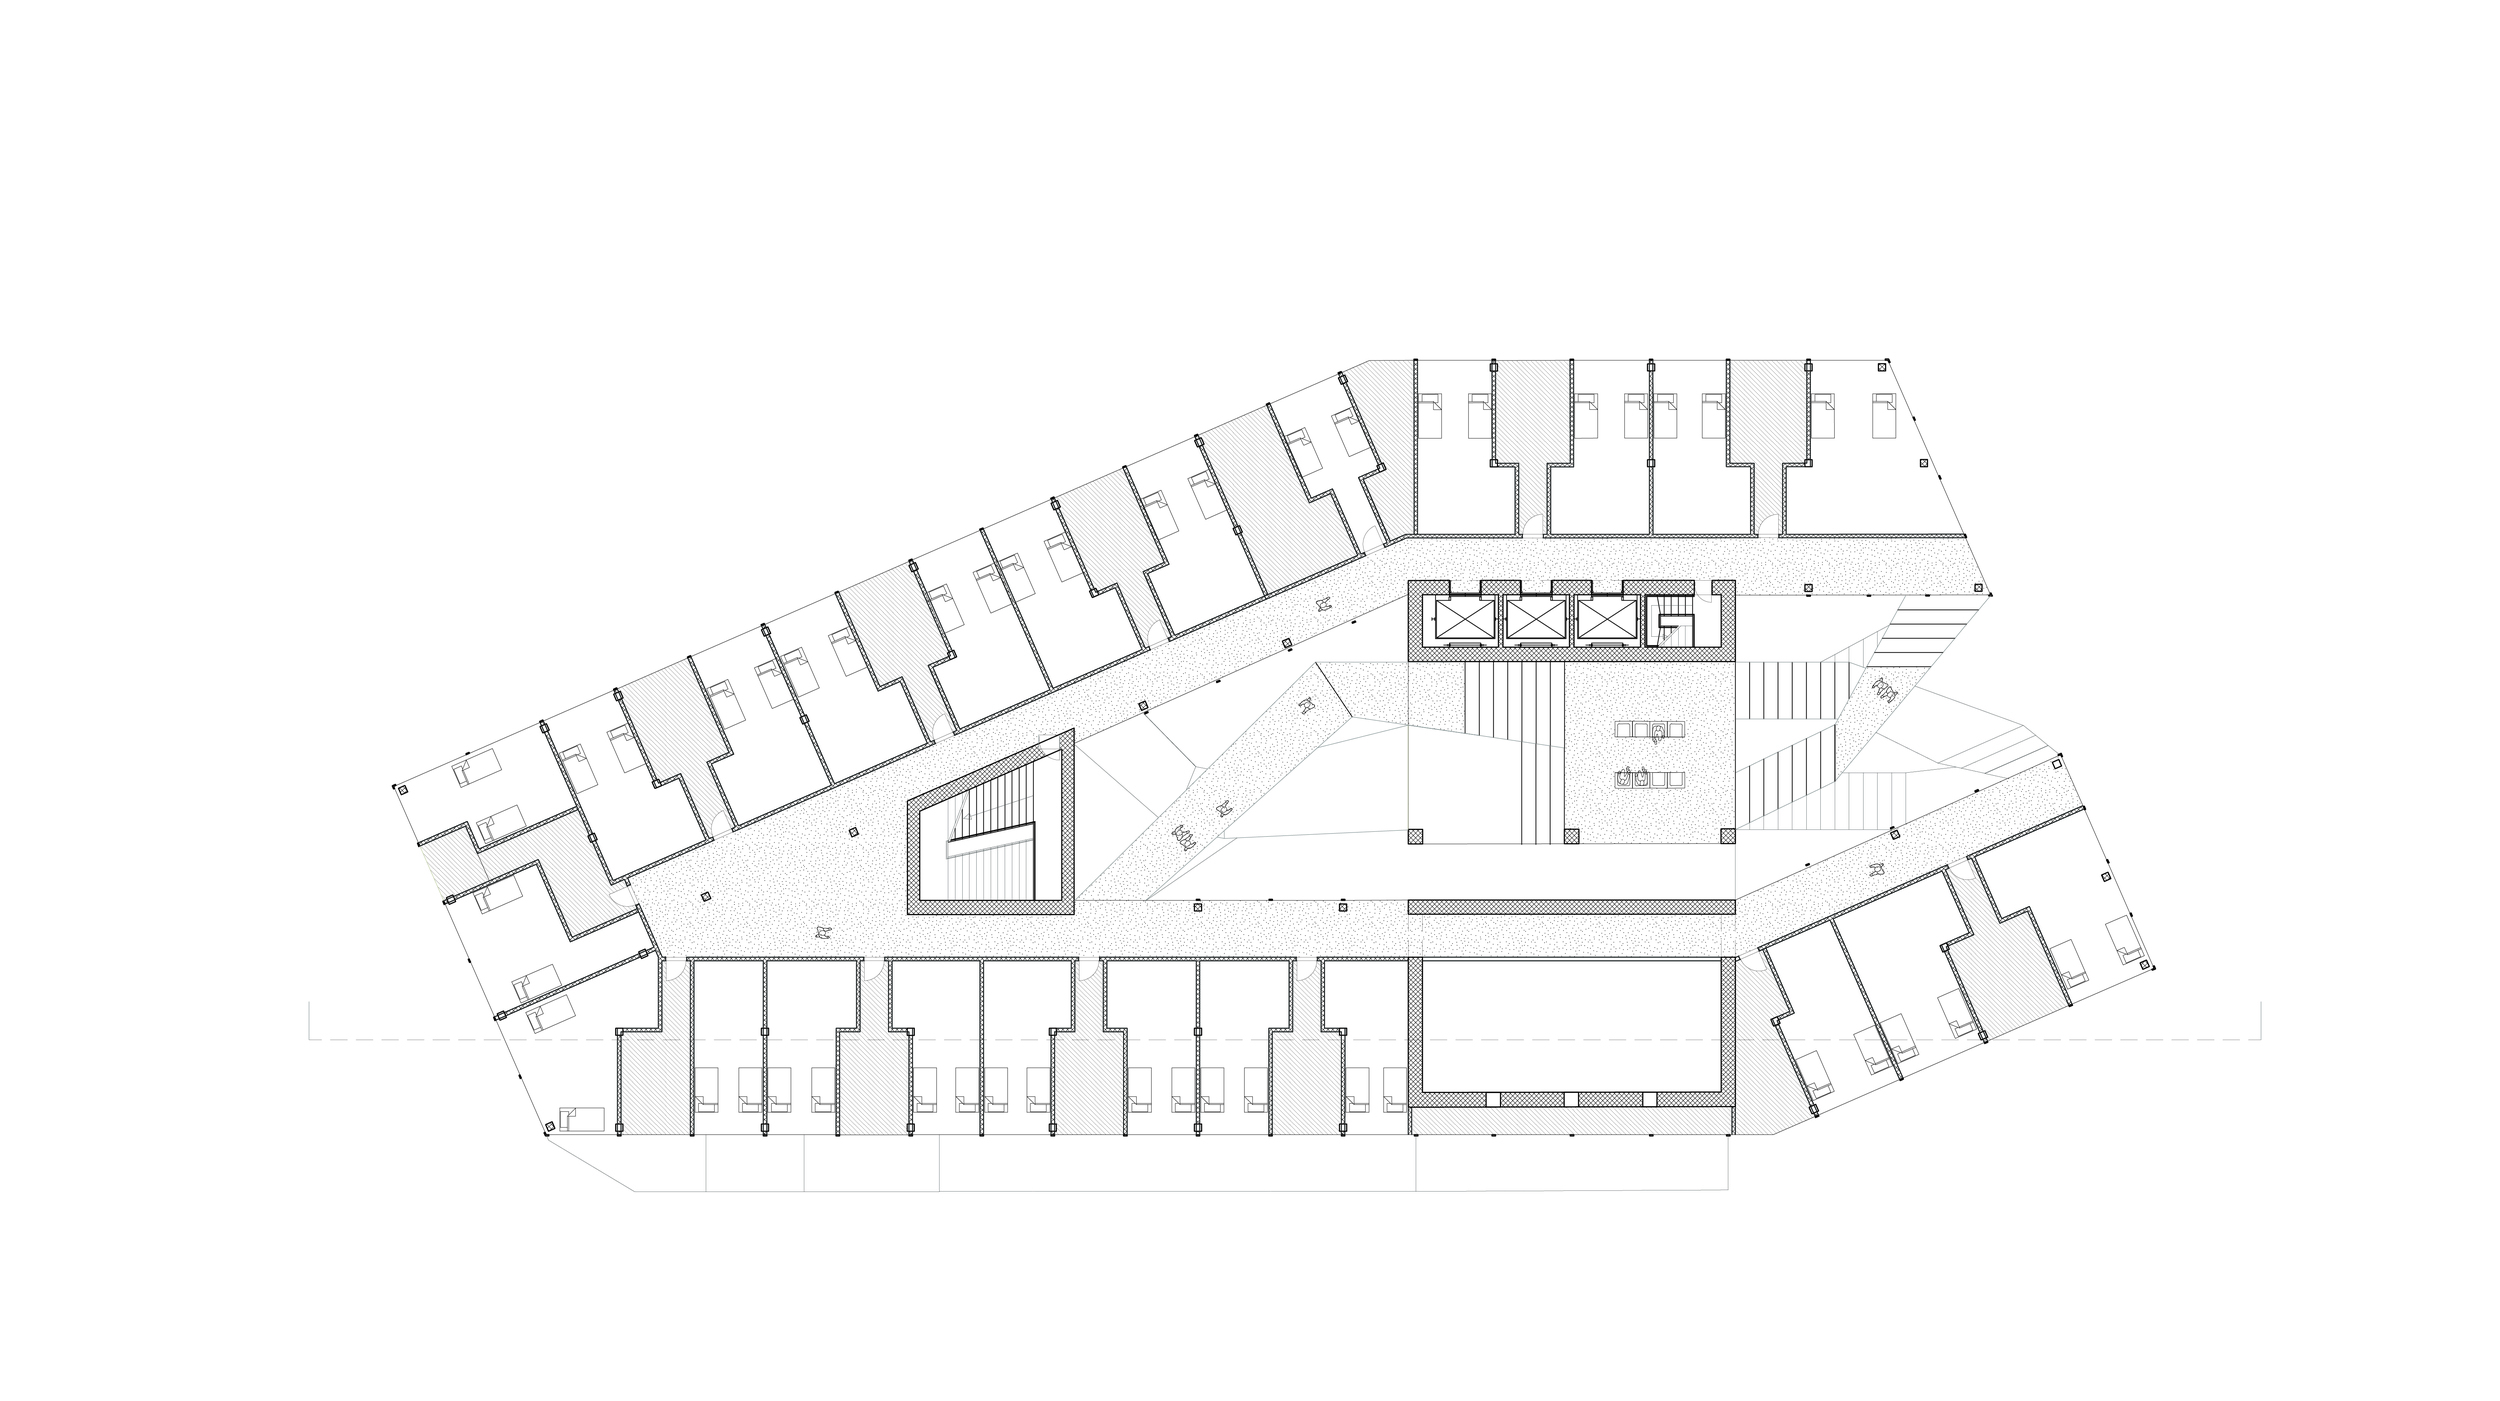 dormitory plan